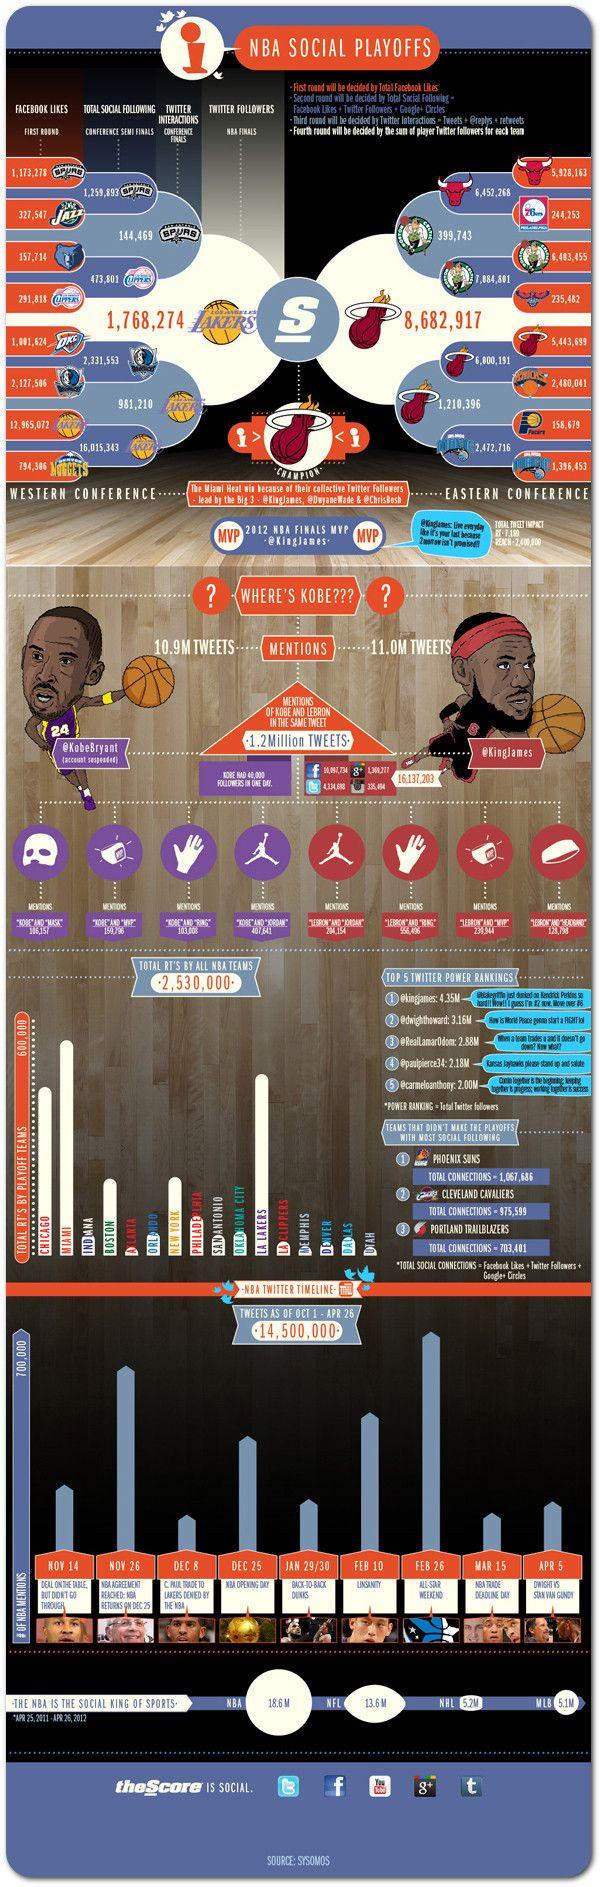 LeBron James named 'king' of social media #Infographic